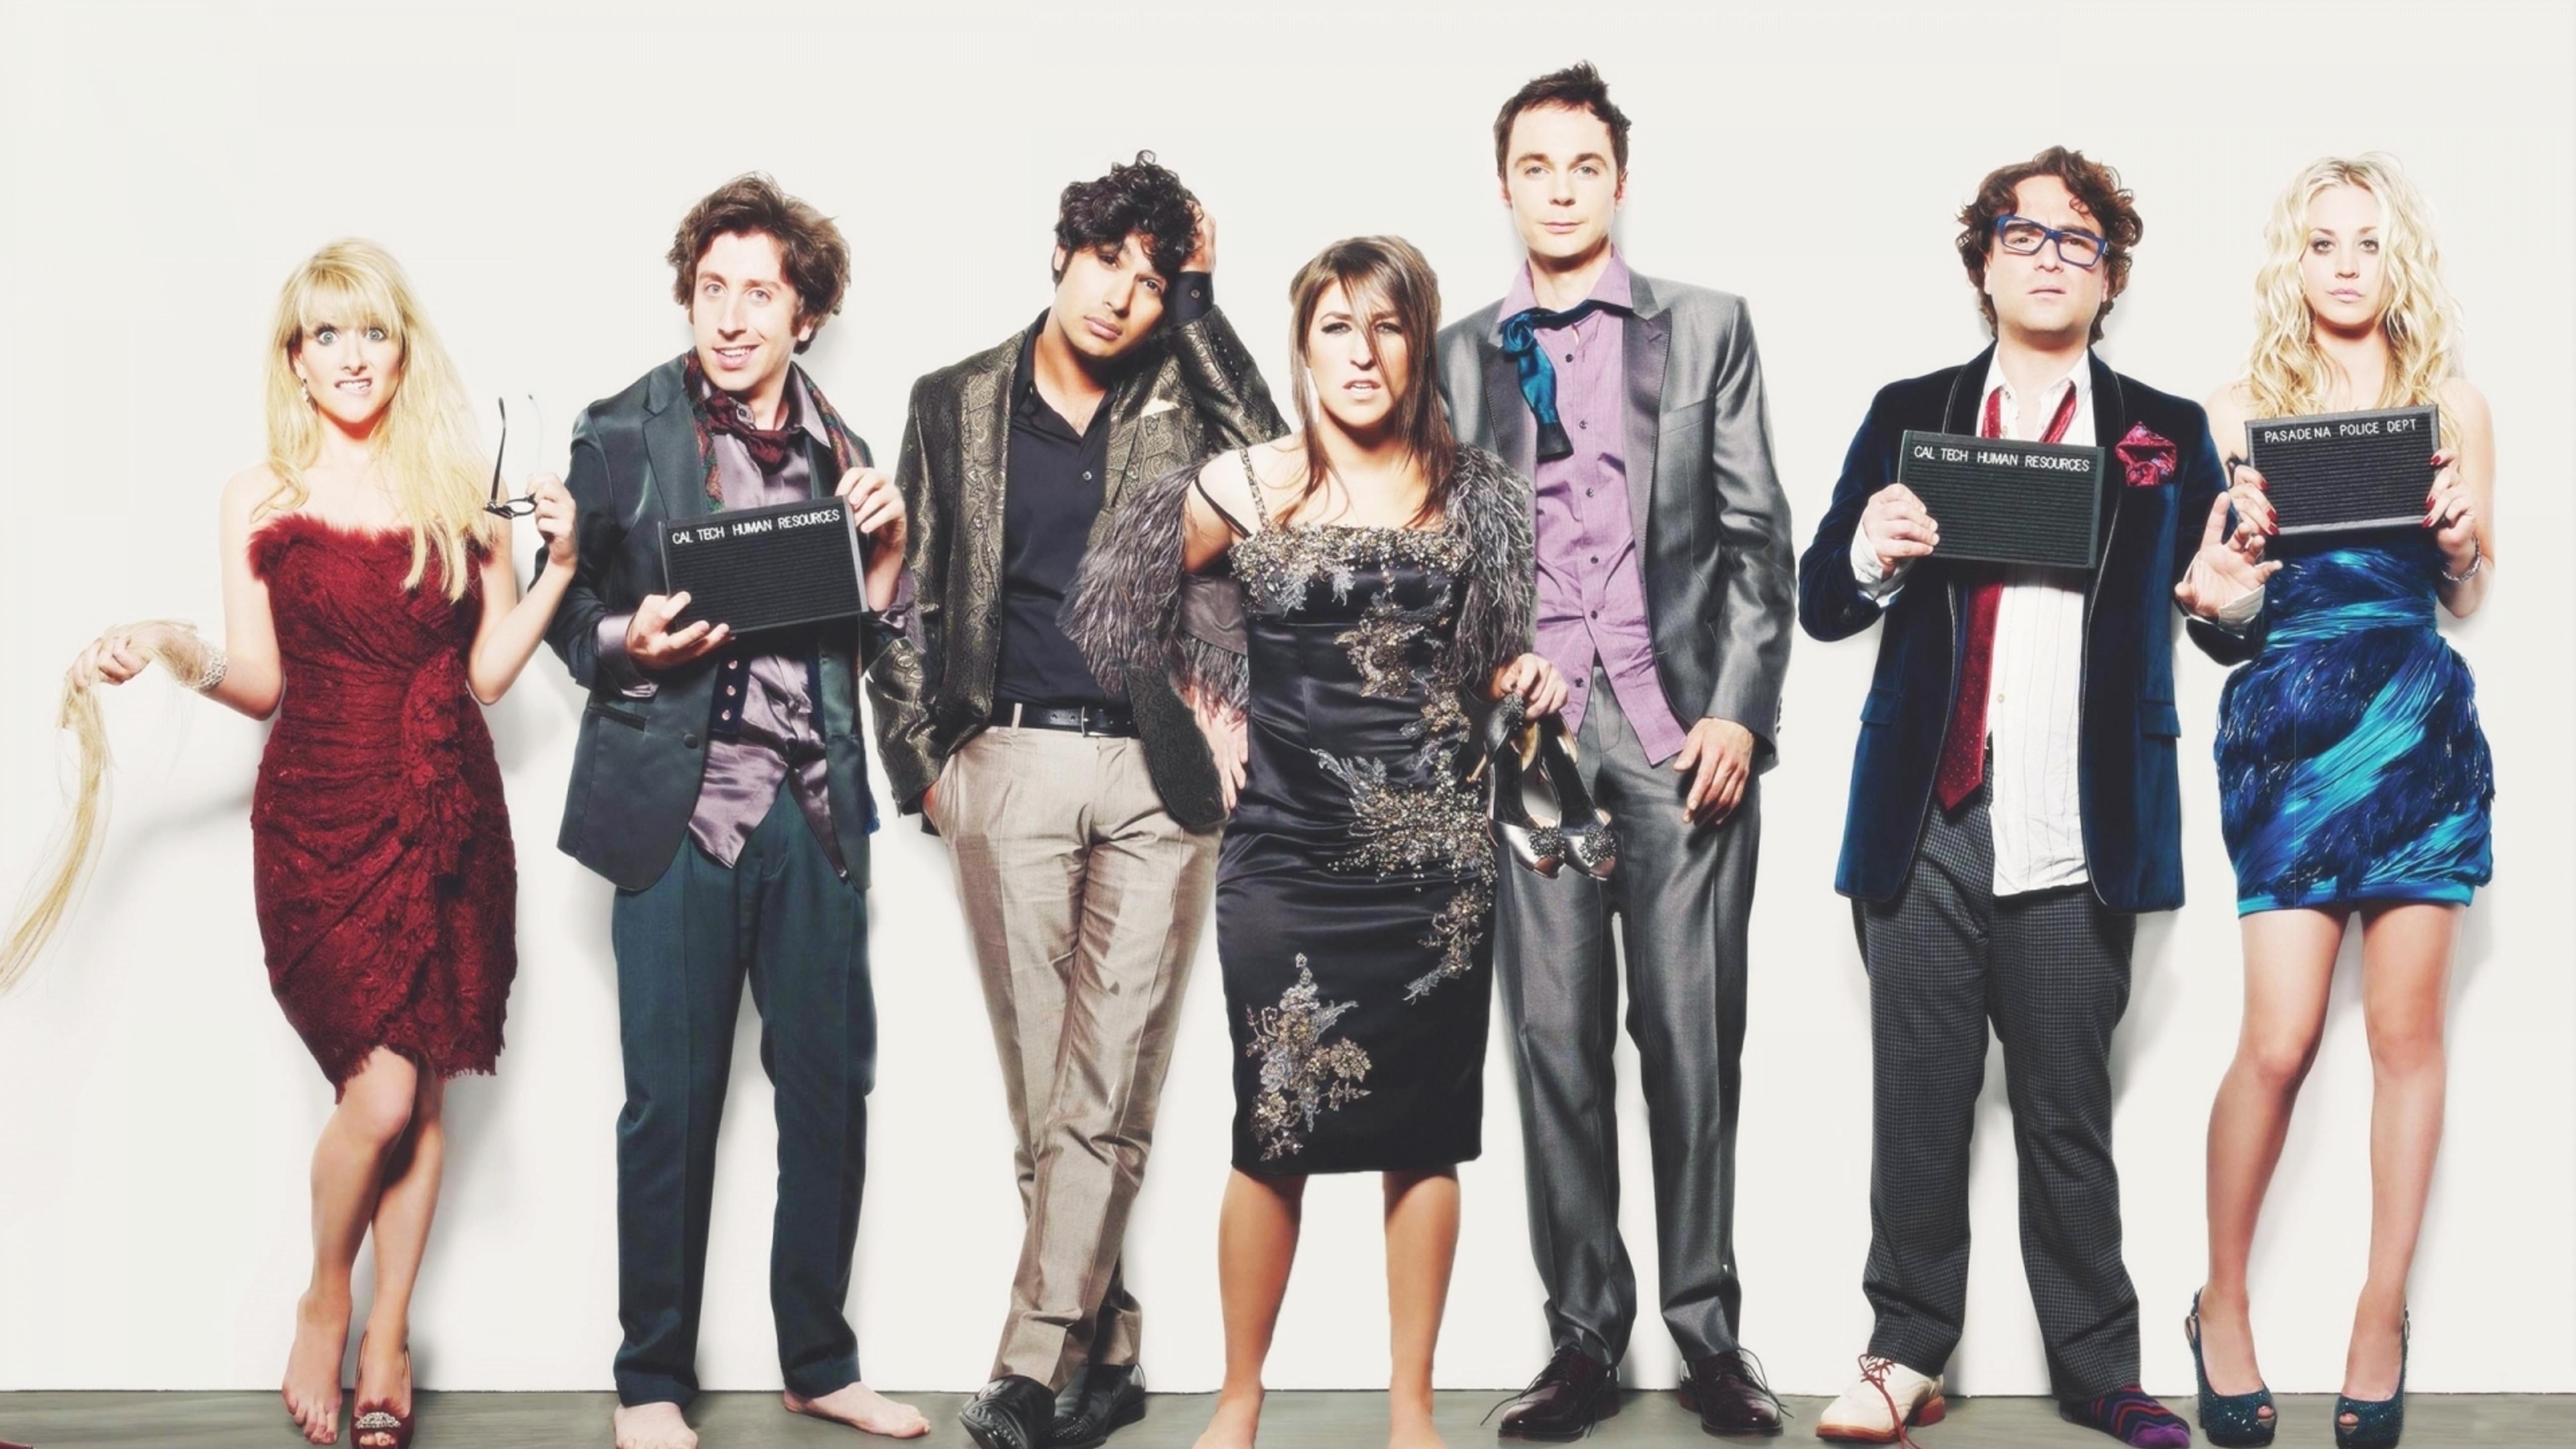 Download Wallpaper 5120x2880 Actors From The Big Bang Theory